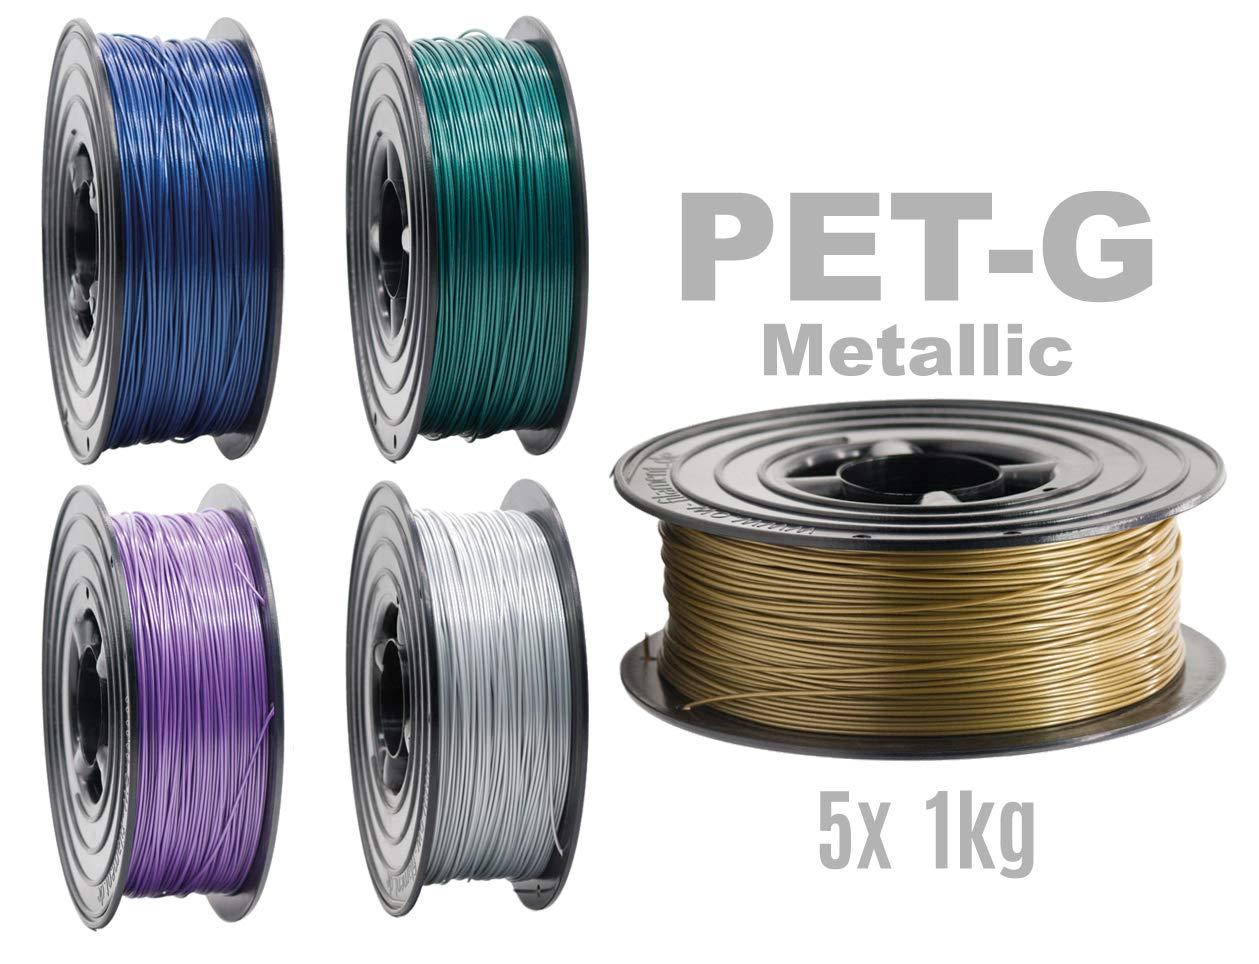 PETG Filamento para impresora 3D, 1,75 mm/5 x 1 kg, rollo 5 ...